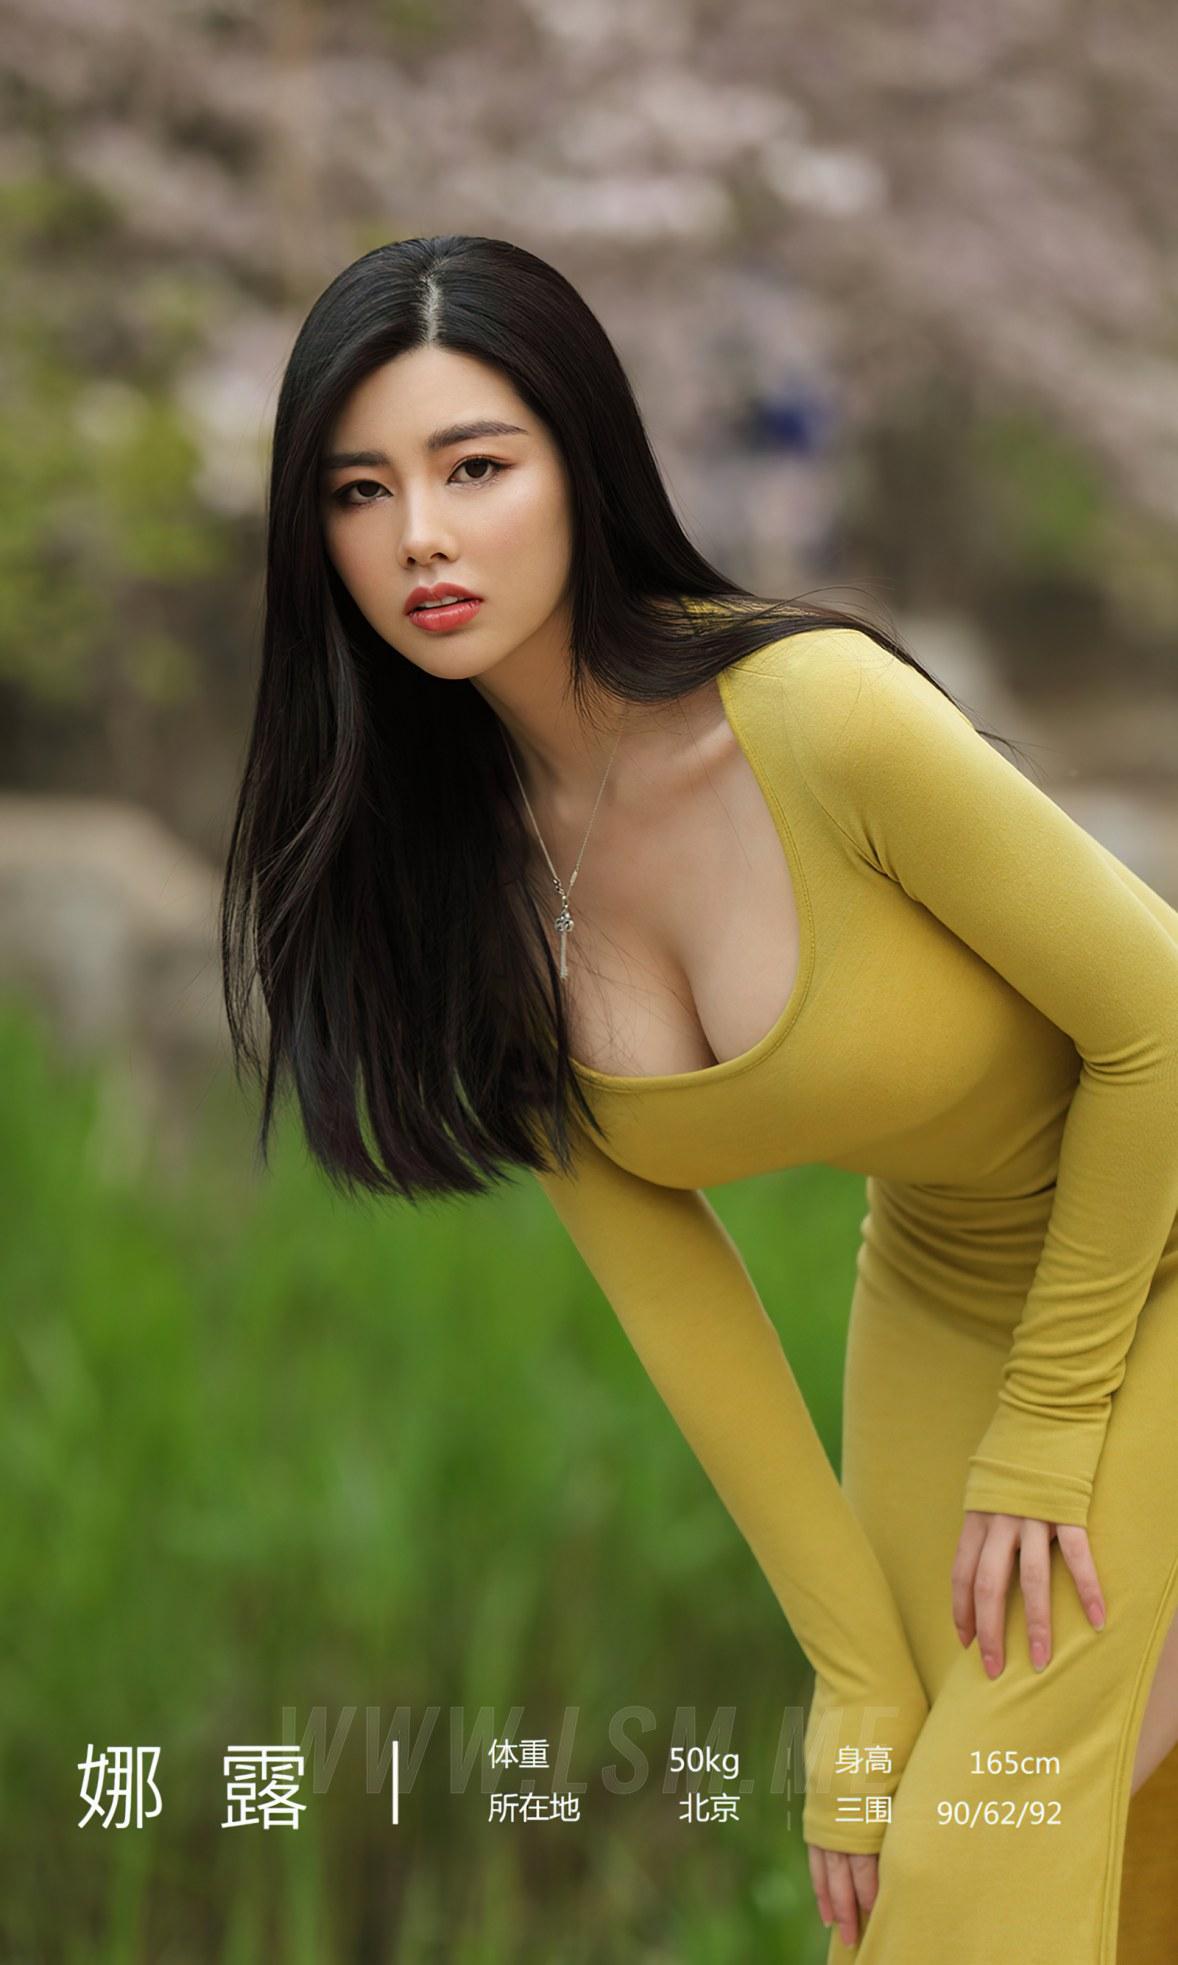 UGirls 爱尤物 No.2074 娜露 赏春 - 3